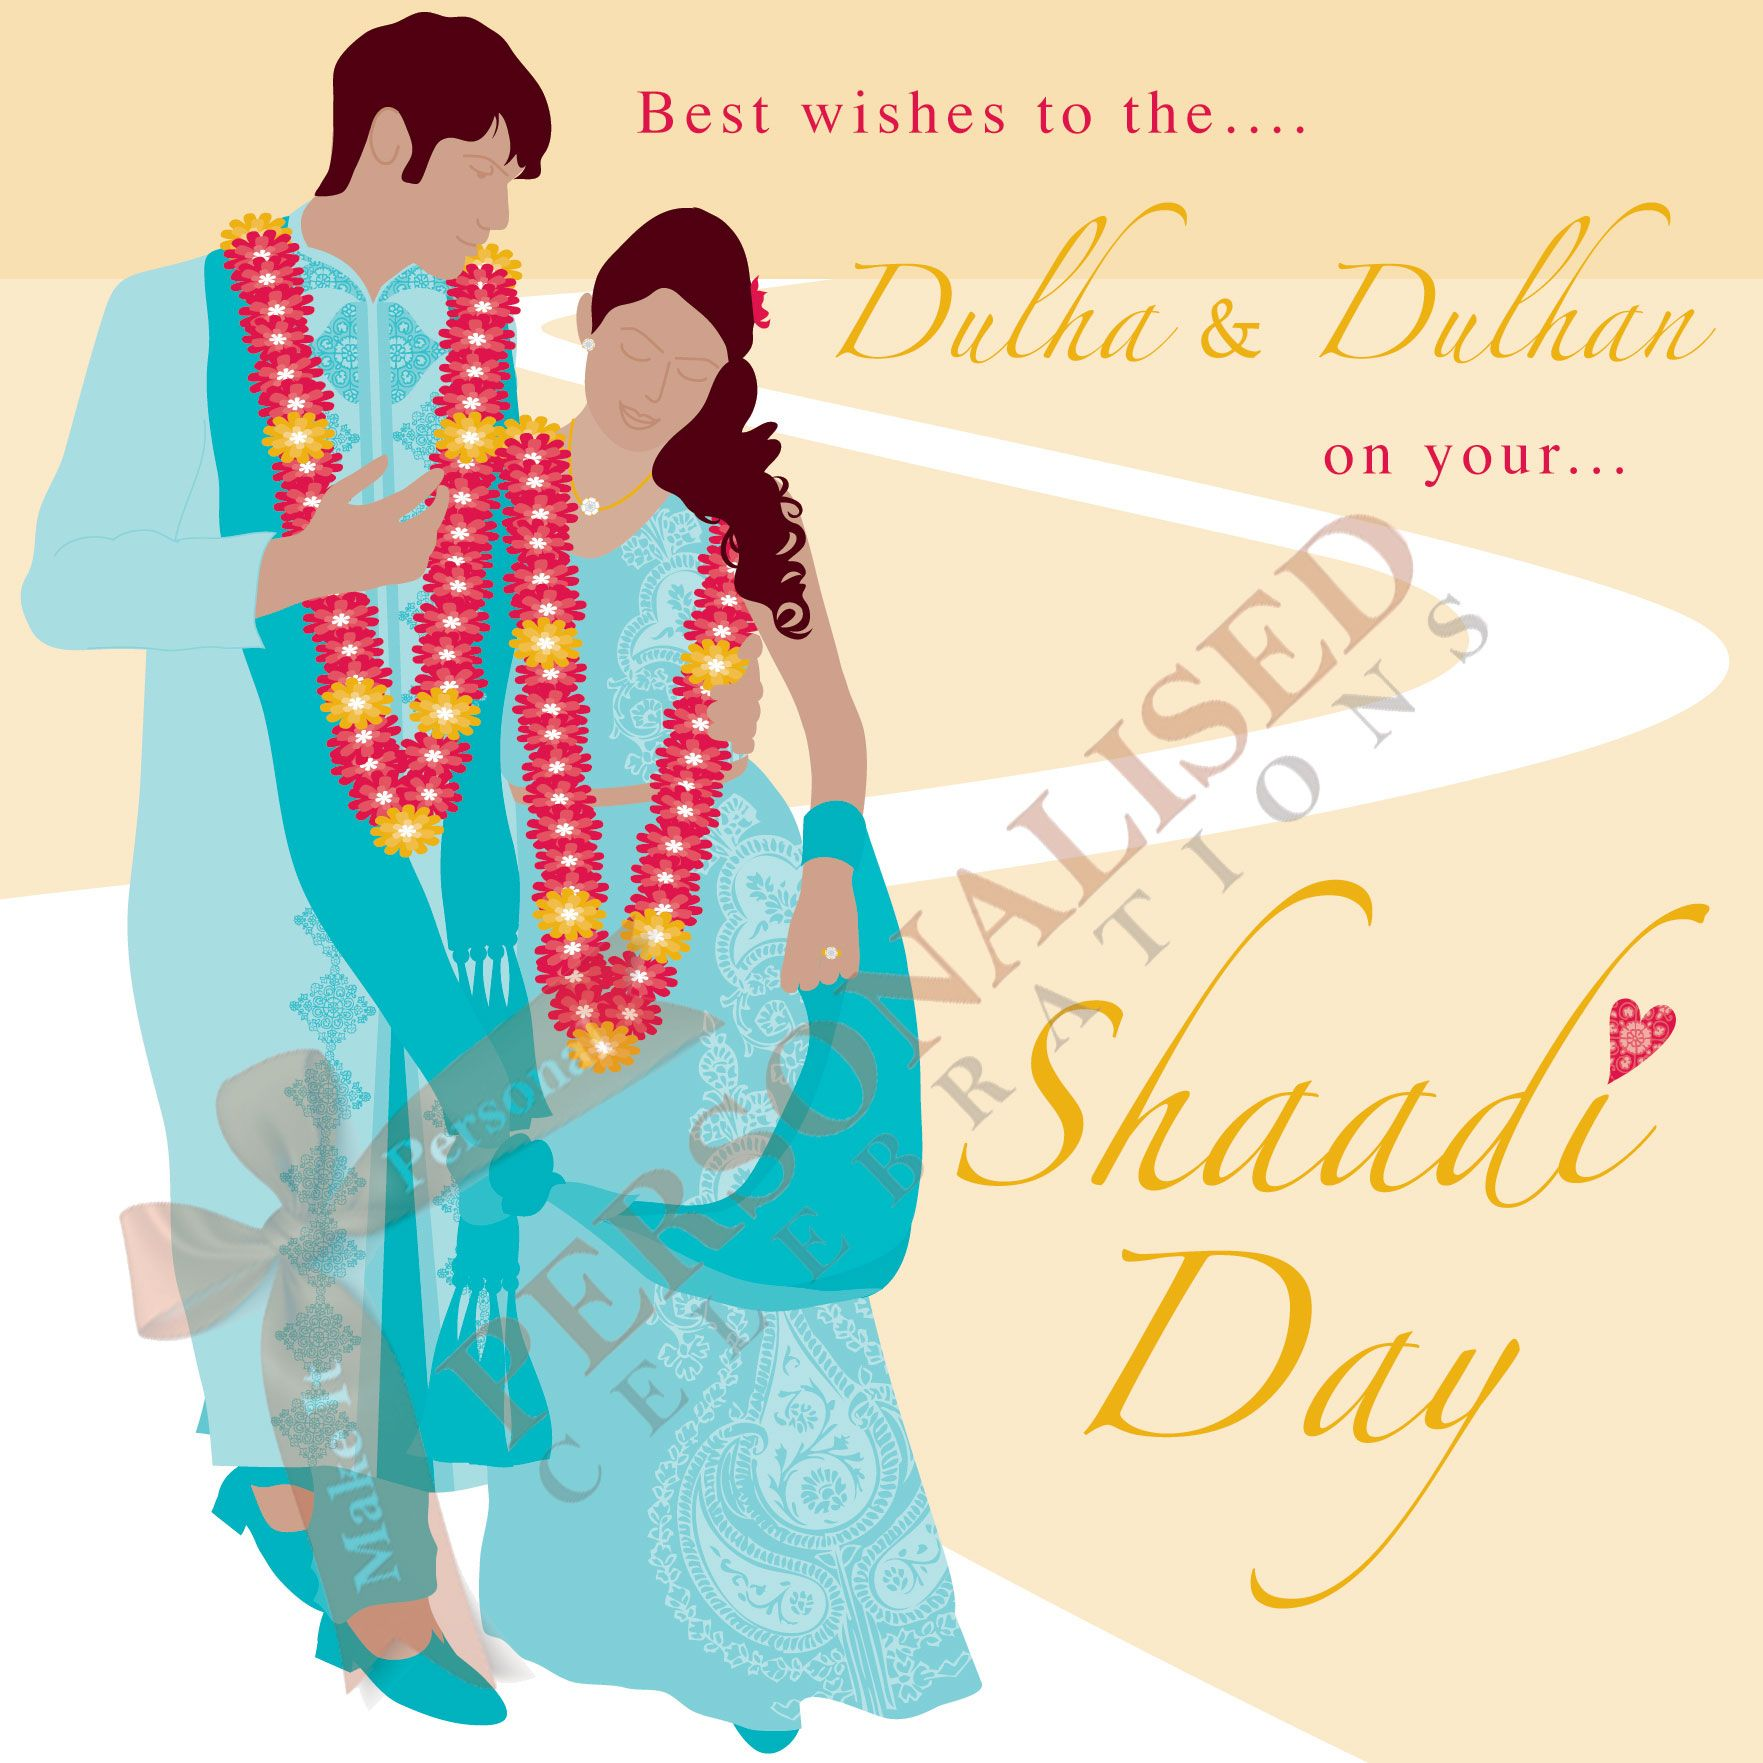 Shaadi card wedding card buy this card online only 199 at http shaadi card wedding card buy this card online only 199 at httppersonalisedcelebrationsindexpasian greeting cardsml m4hsunfo